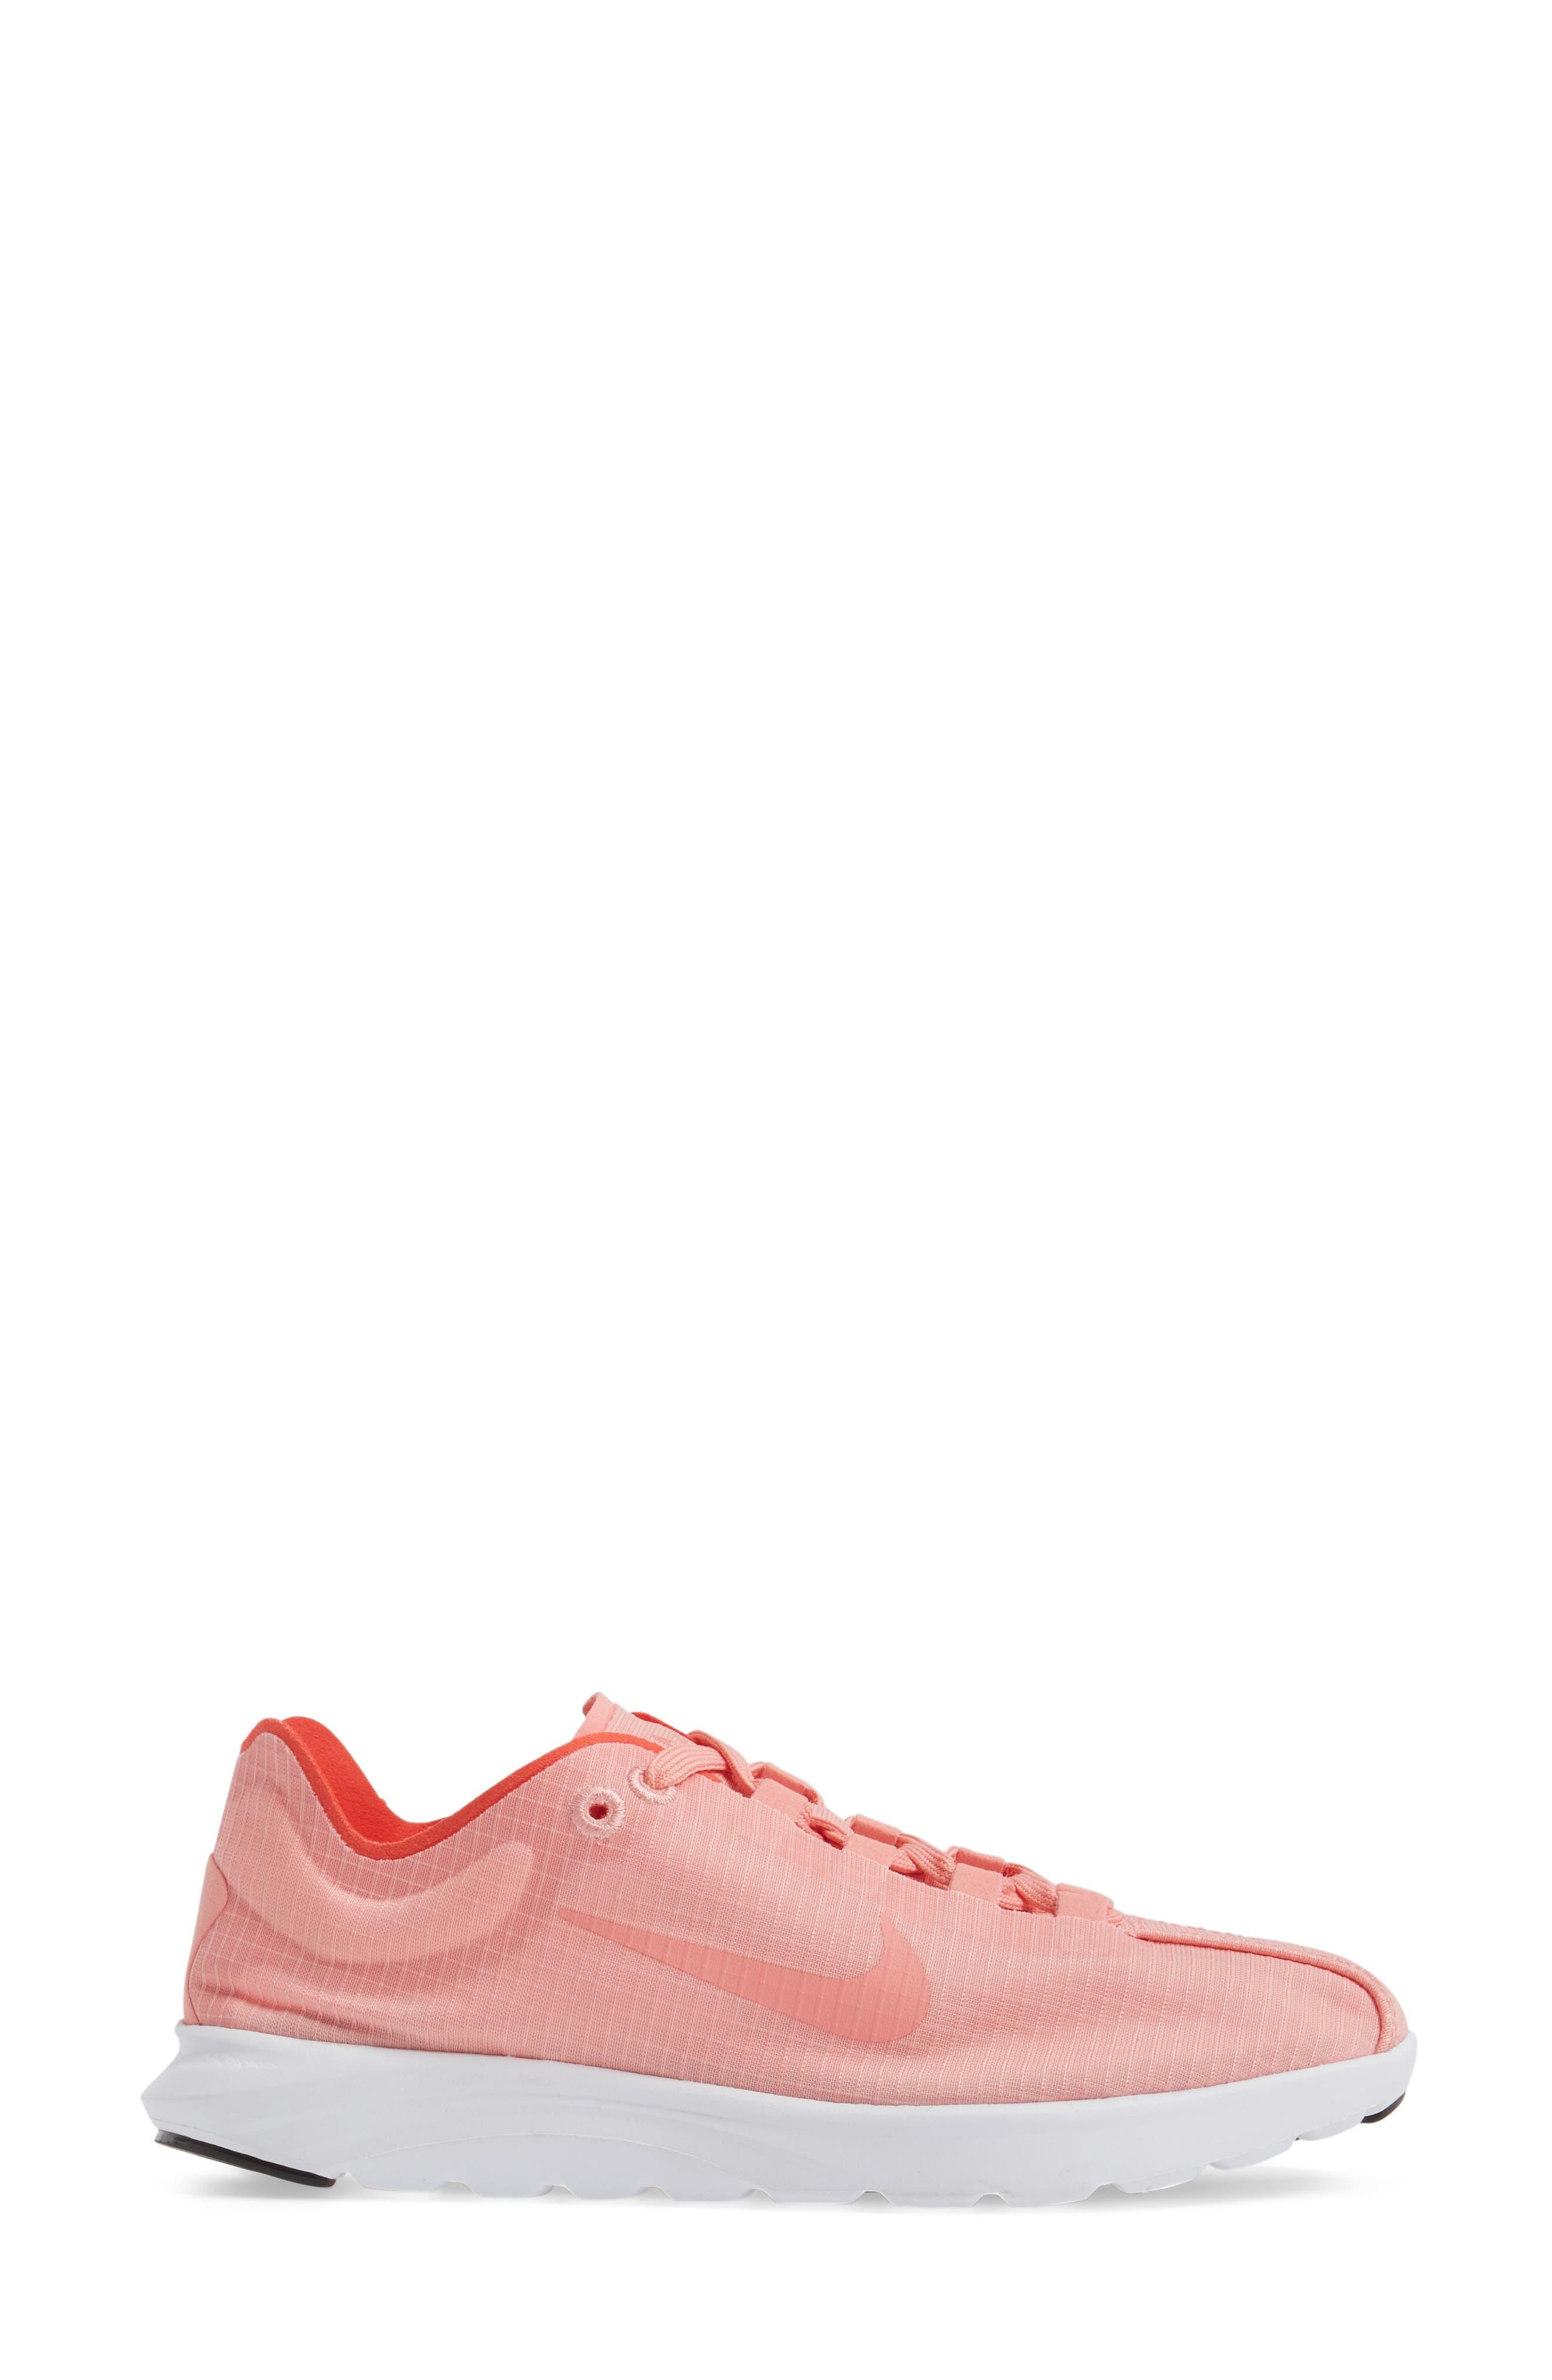 Alternate Image 3  - Nike Mayfly Lite SE Sneaker (Women)